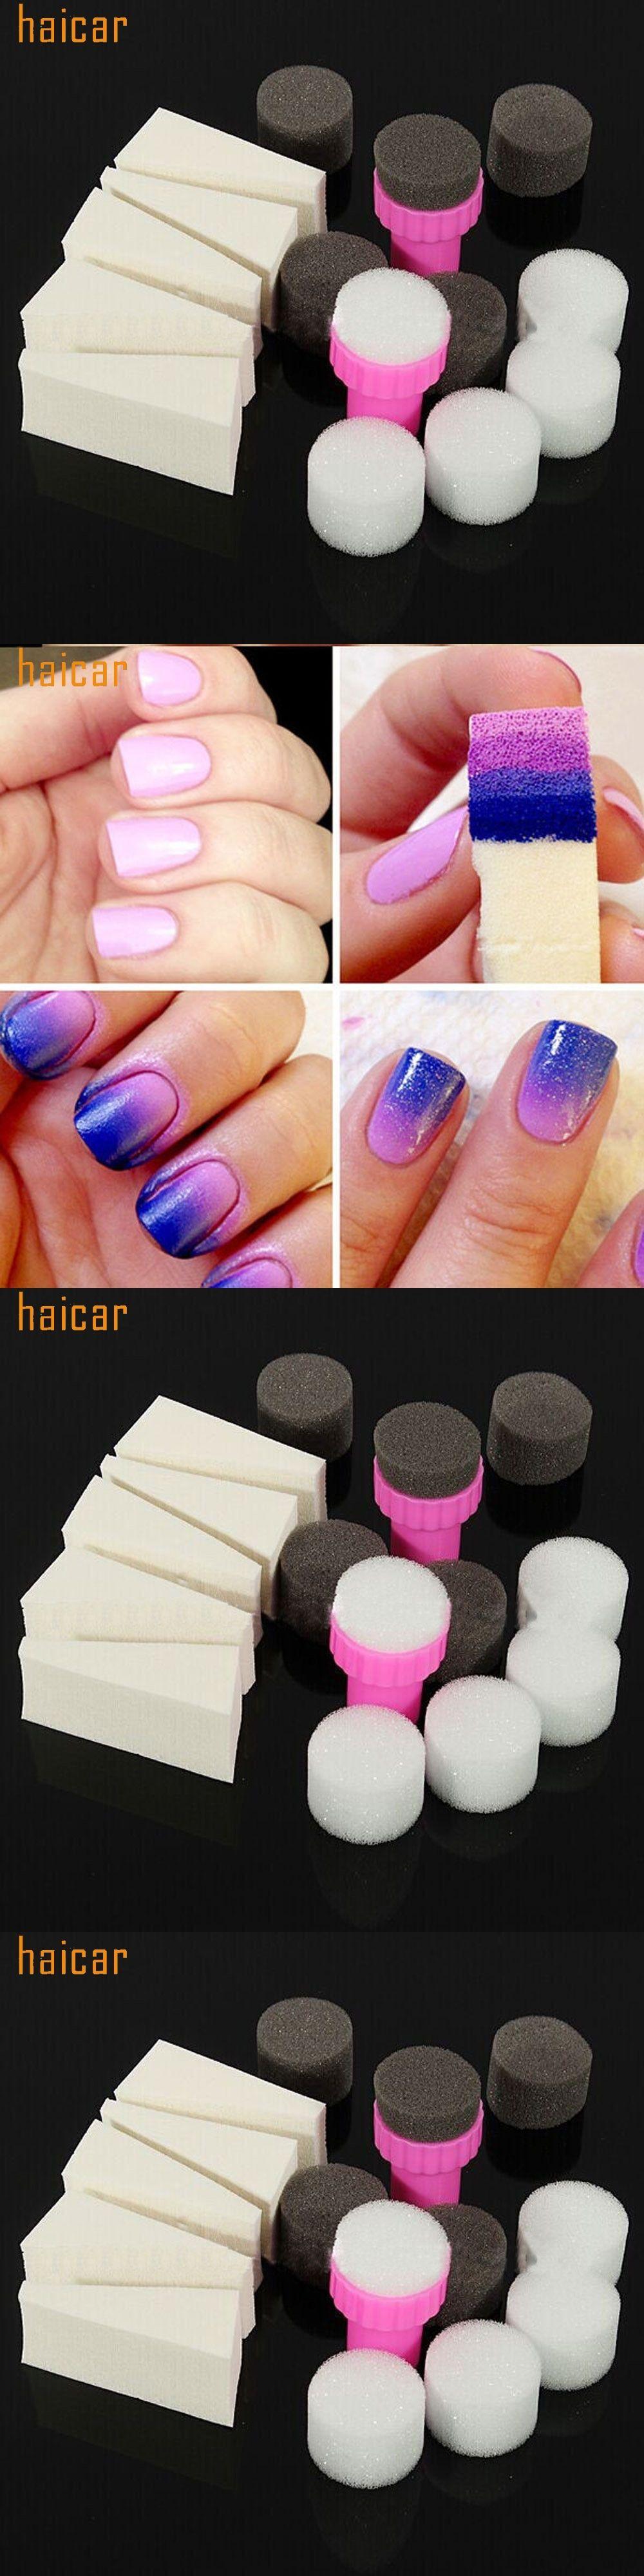 Haicar Love Beauty Female 1 Set Diy Nail Art Sponge Stamp Gradient